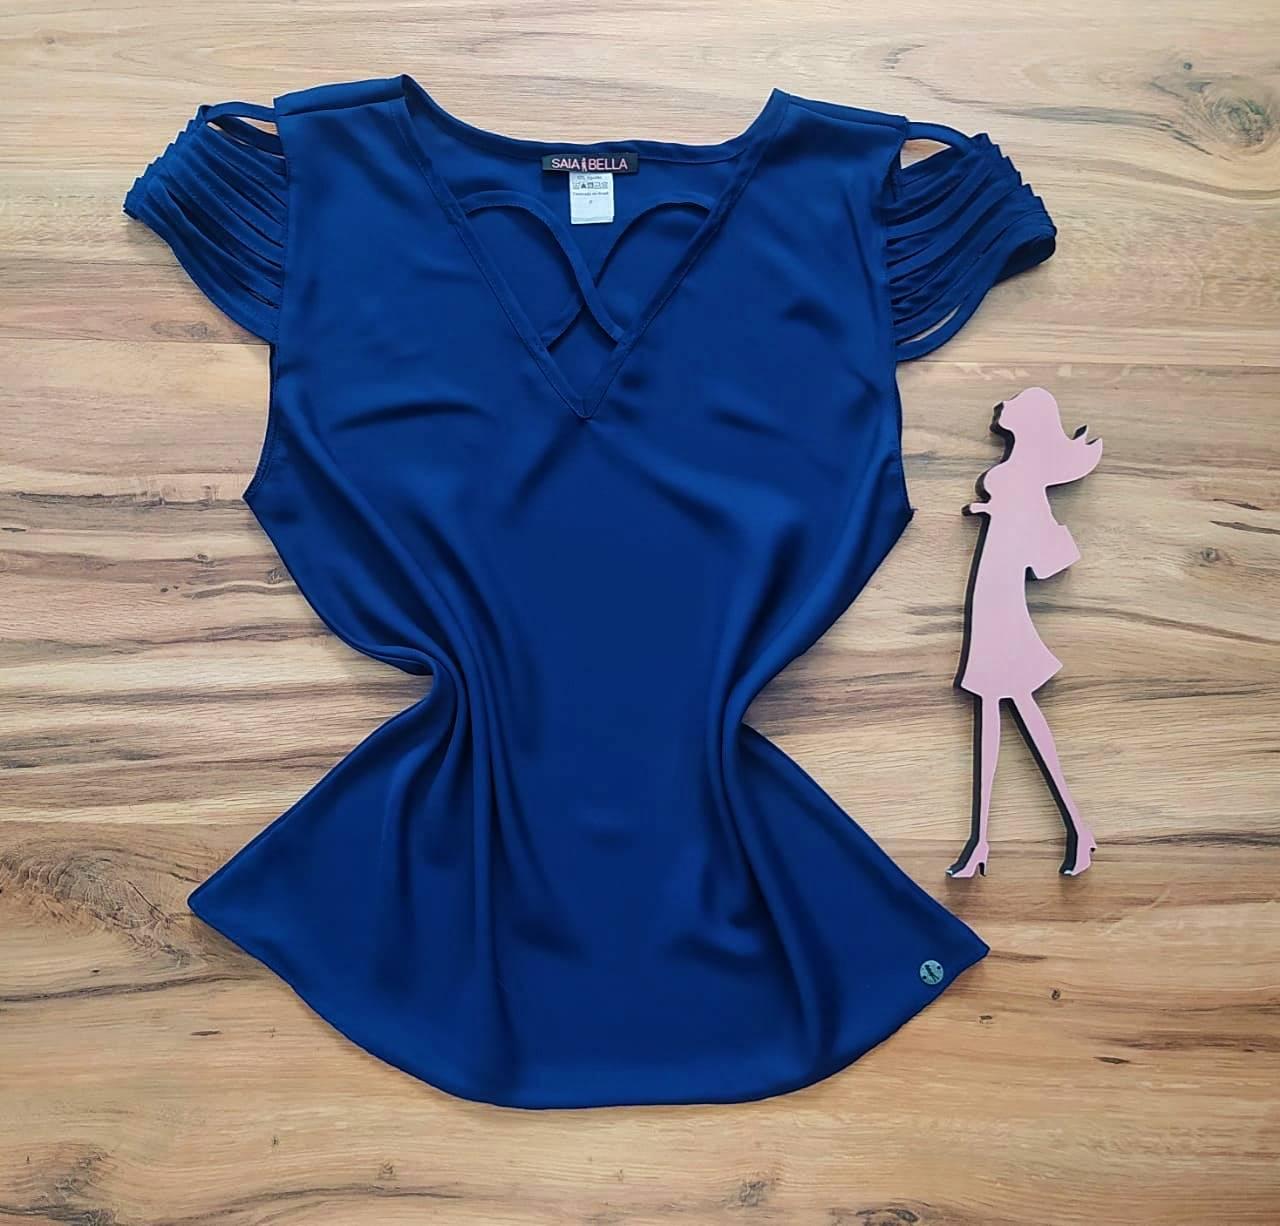 Blusa Sheila Saia Bella - SB8018804. azul marinho